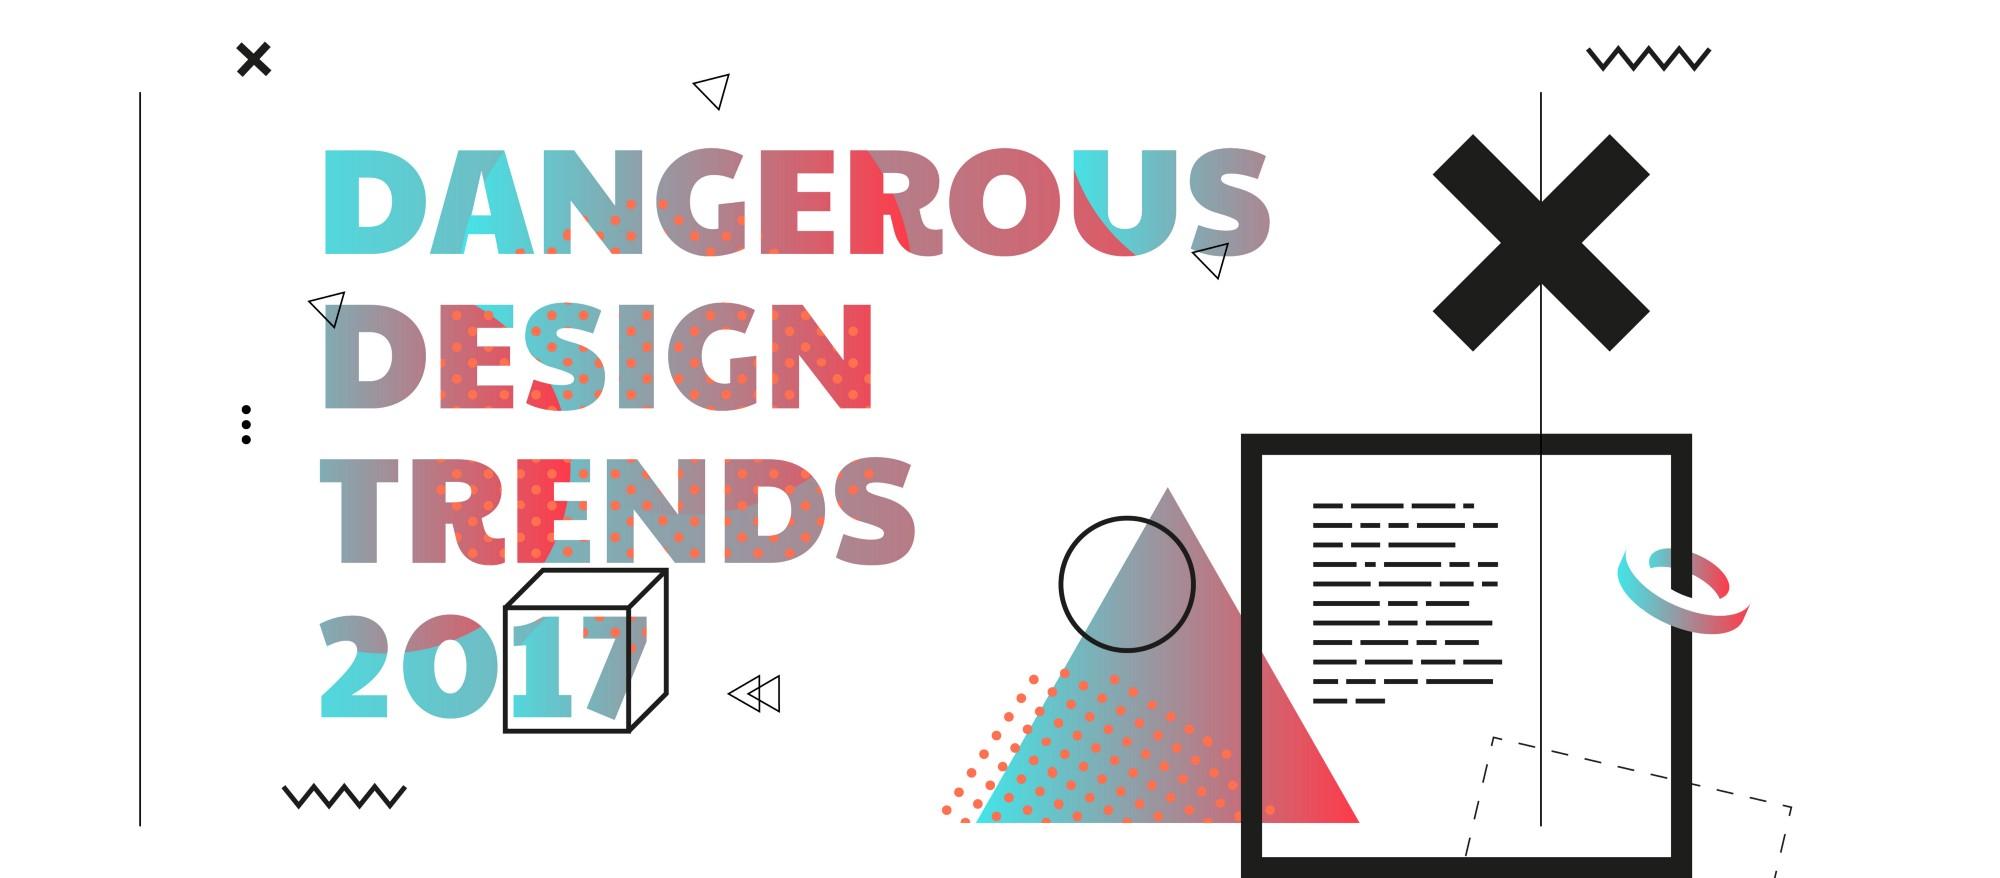 Trend Product Design: Dangerous Design Trends 2017